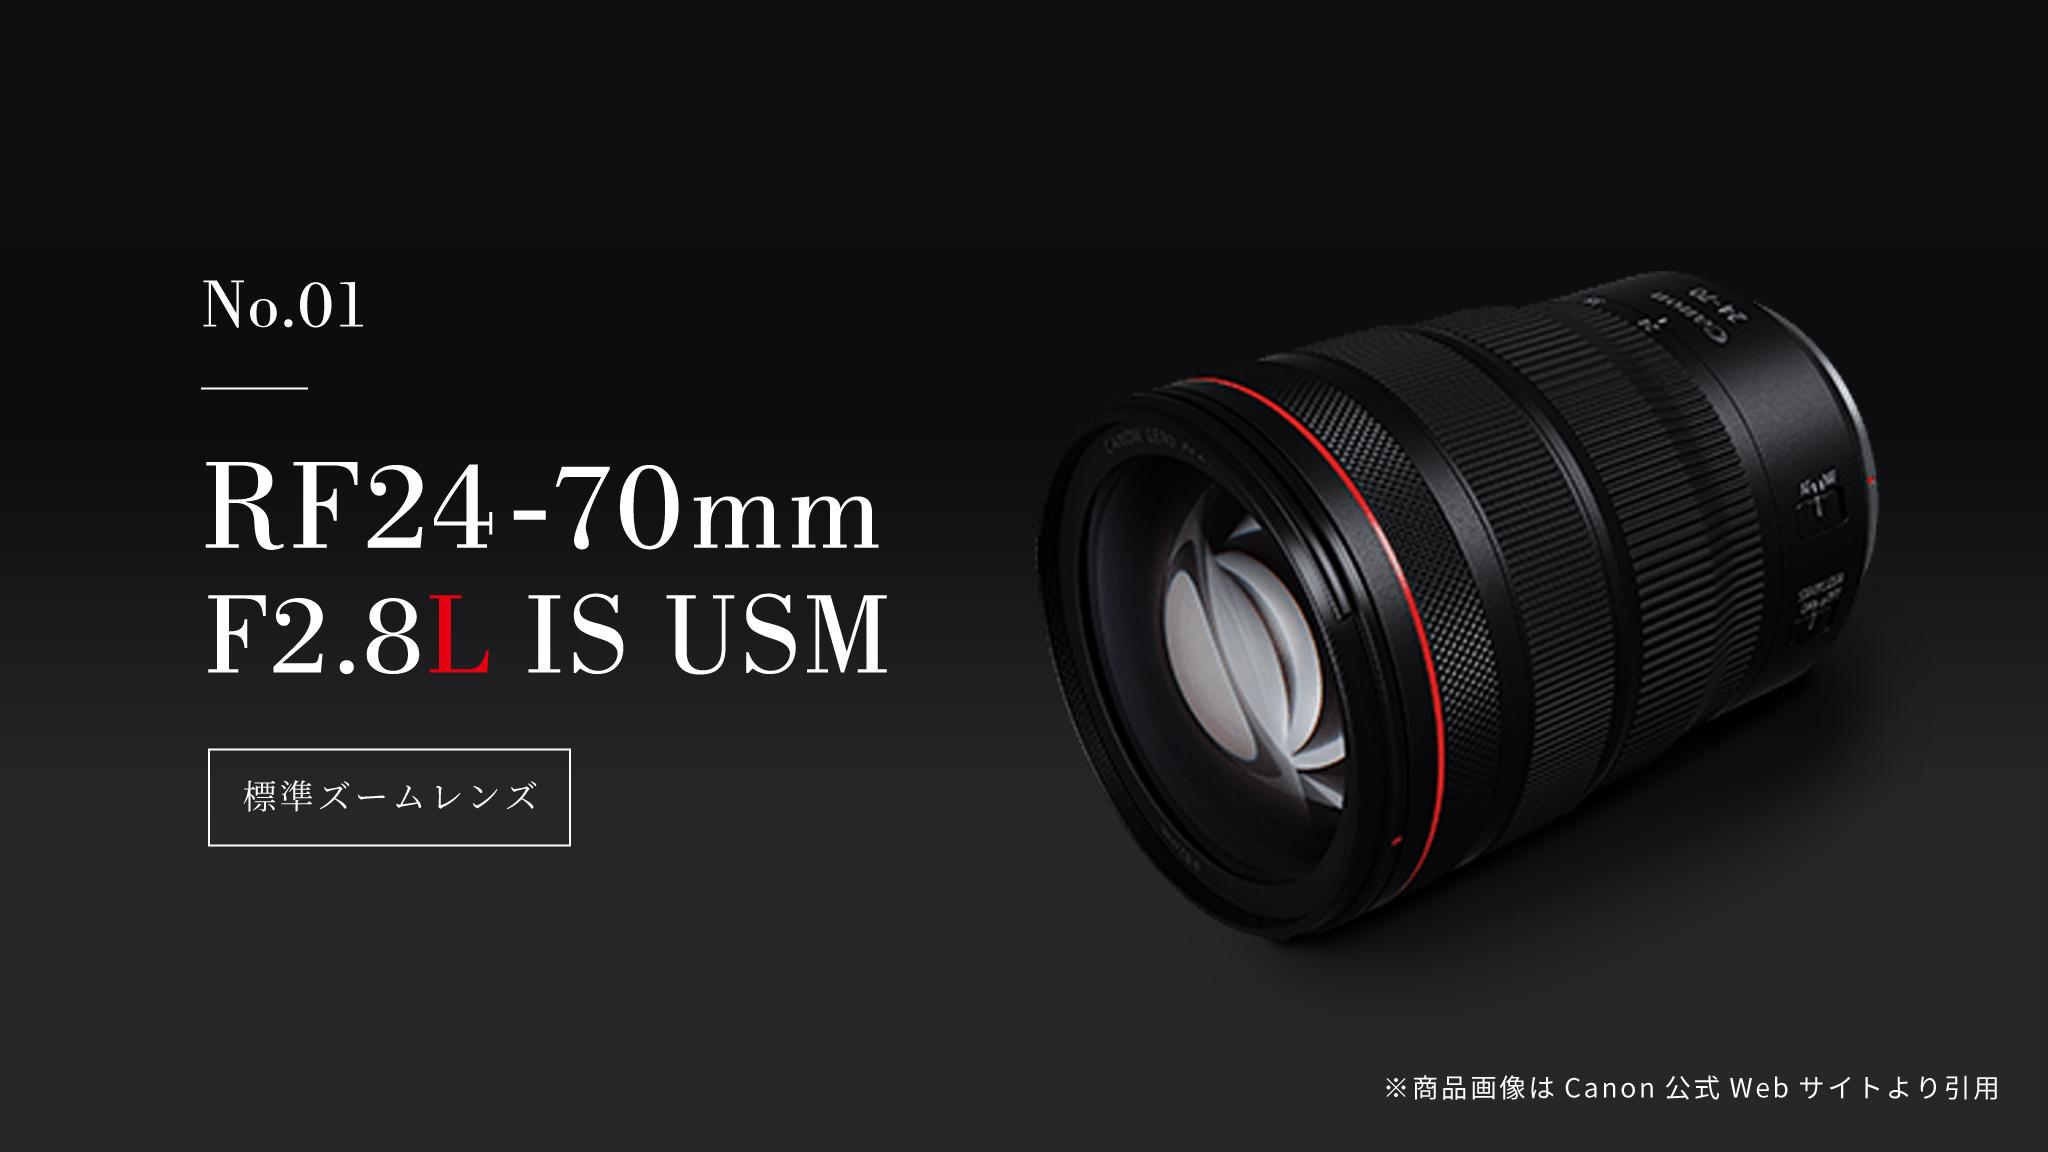 RF24-70mm F2.8 L USMの画像